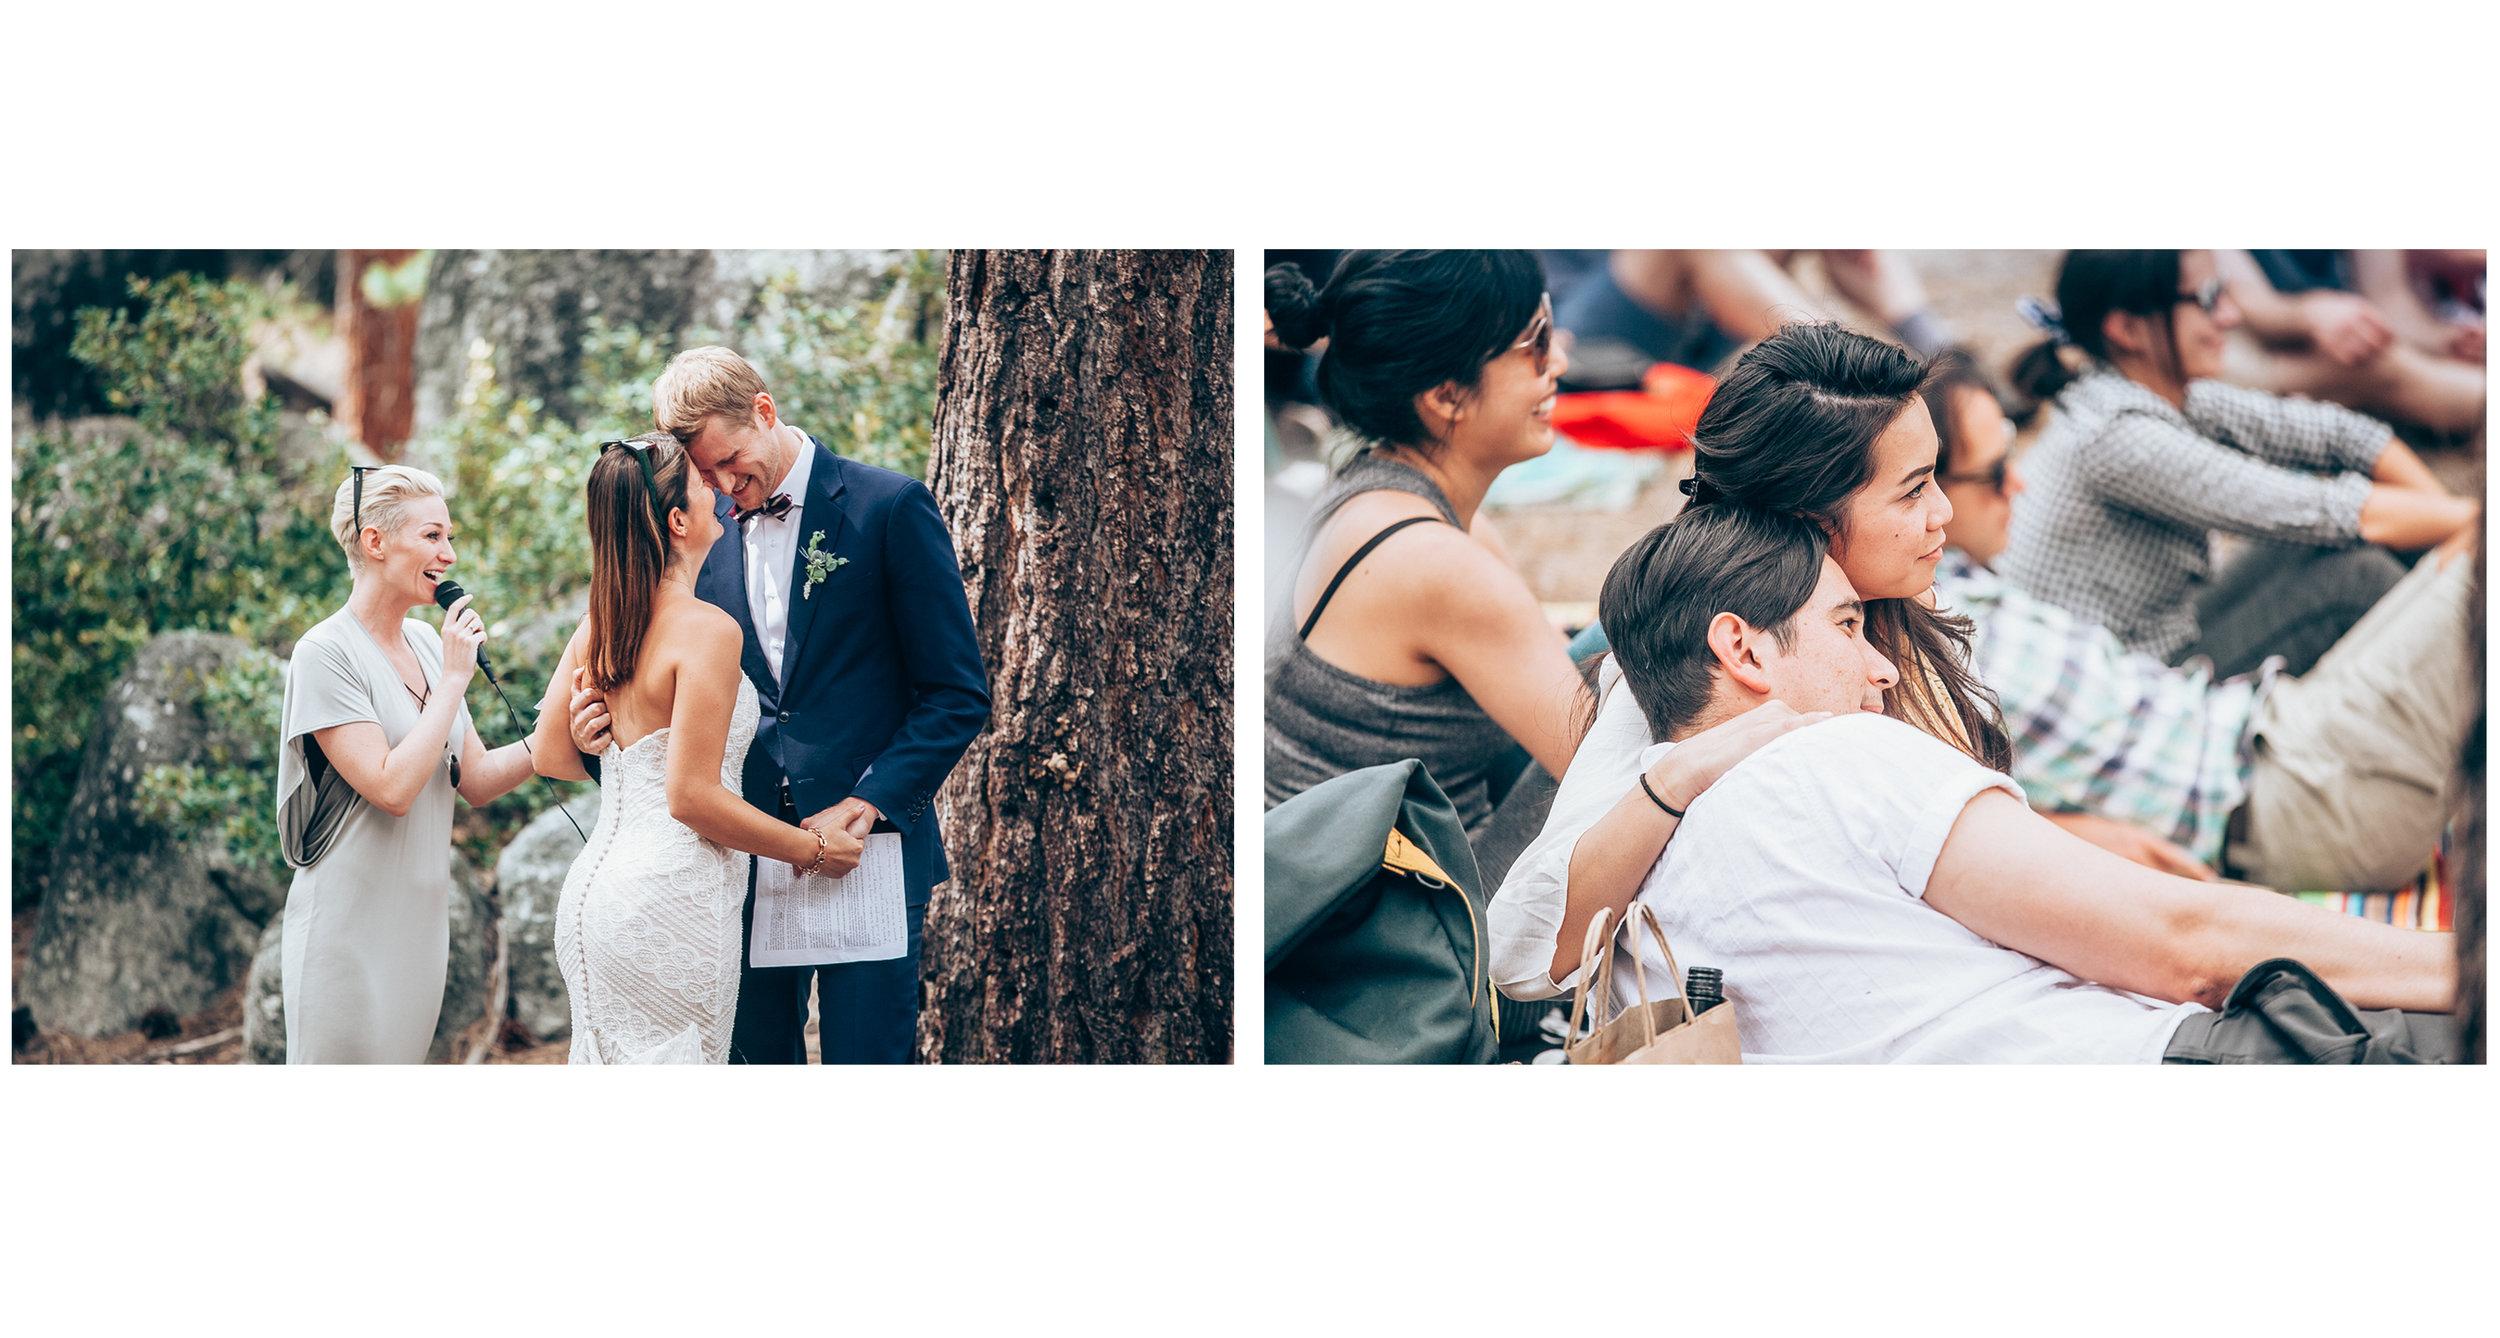 Melisa&David_Wedding_Day_018.jpg